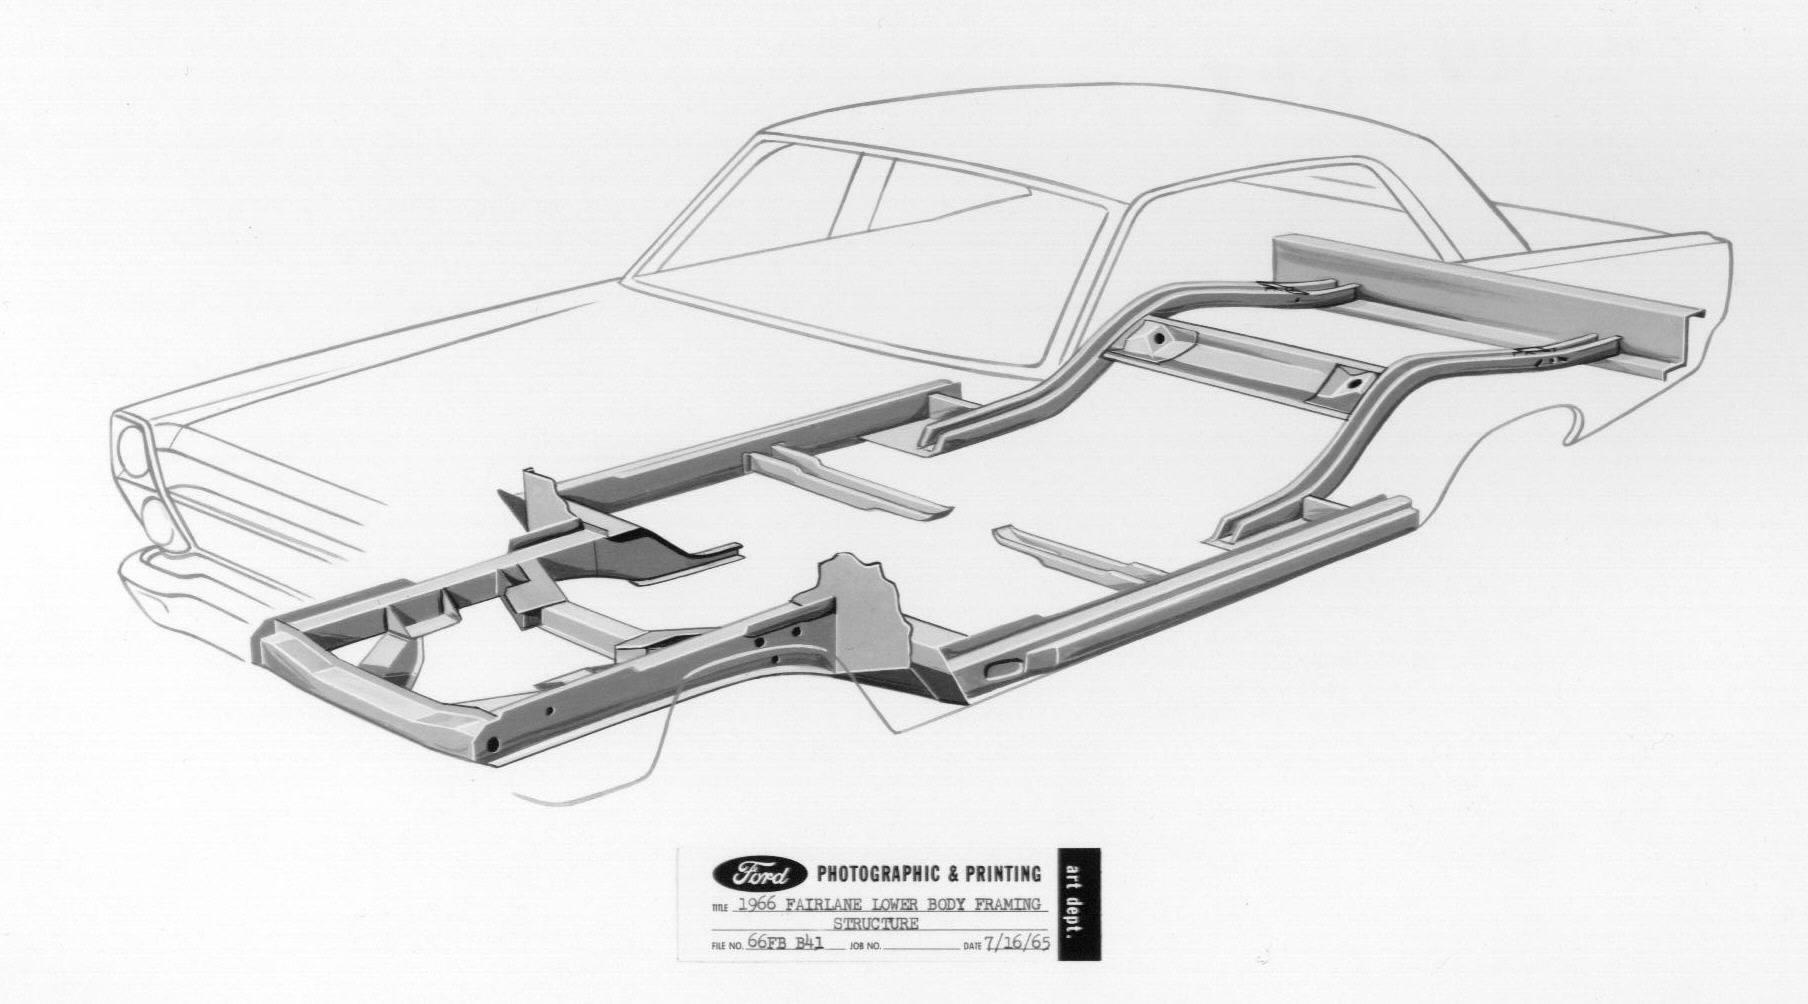 1966 Fairlane 500 390 w/428CJ